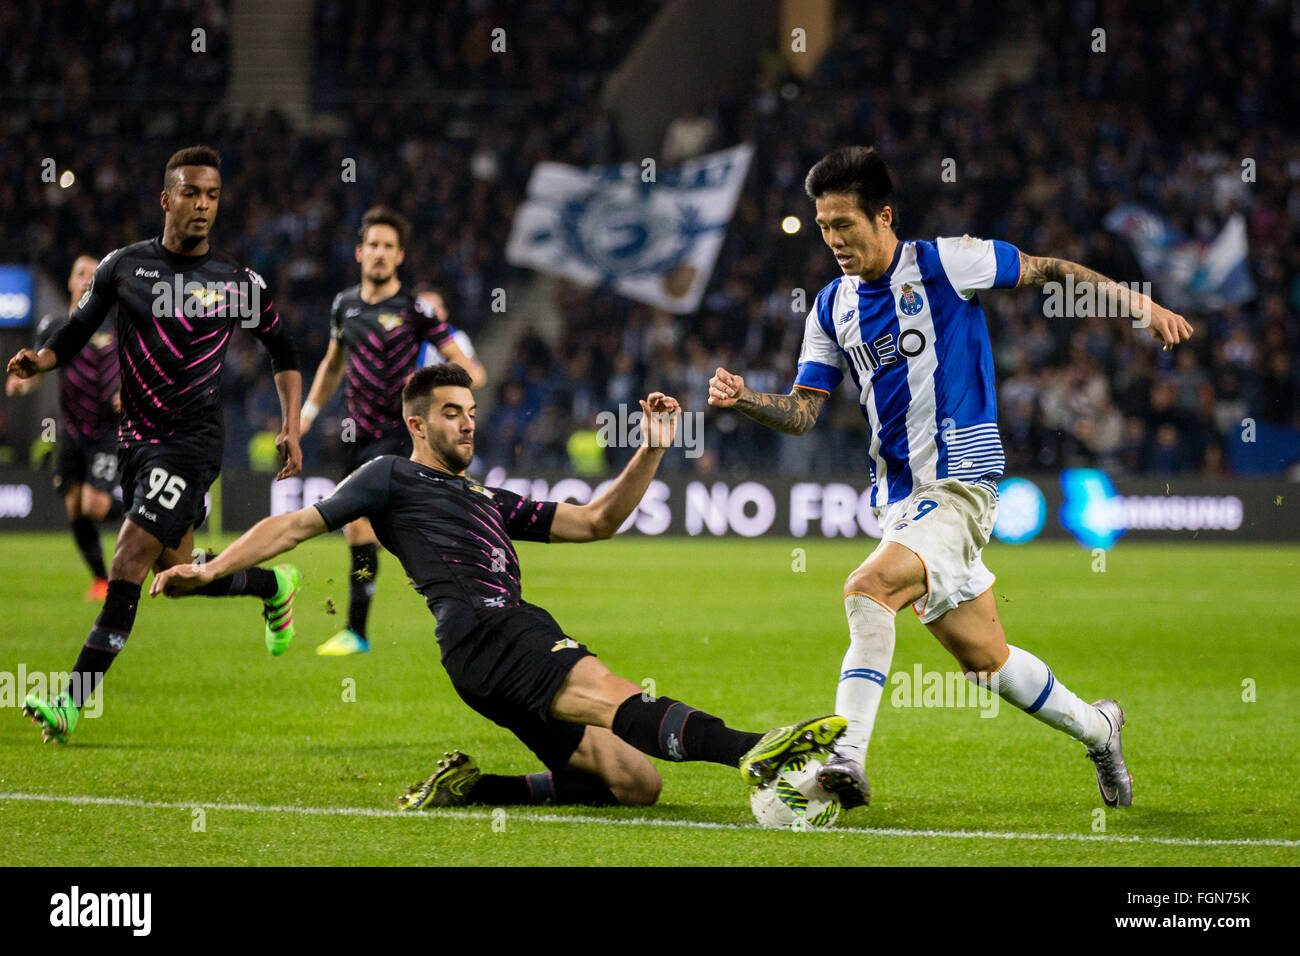 Dragon Stadium, Portugal. 21st February, 2016. FC Porto's player Suk during the Premier League 2015/16 match - Stock Image